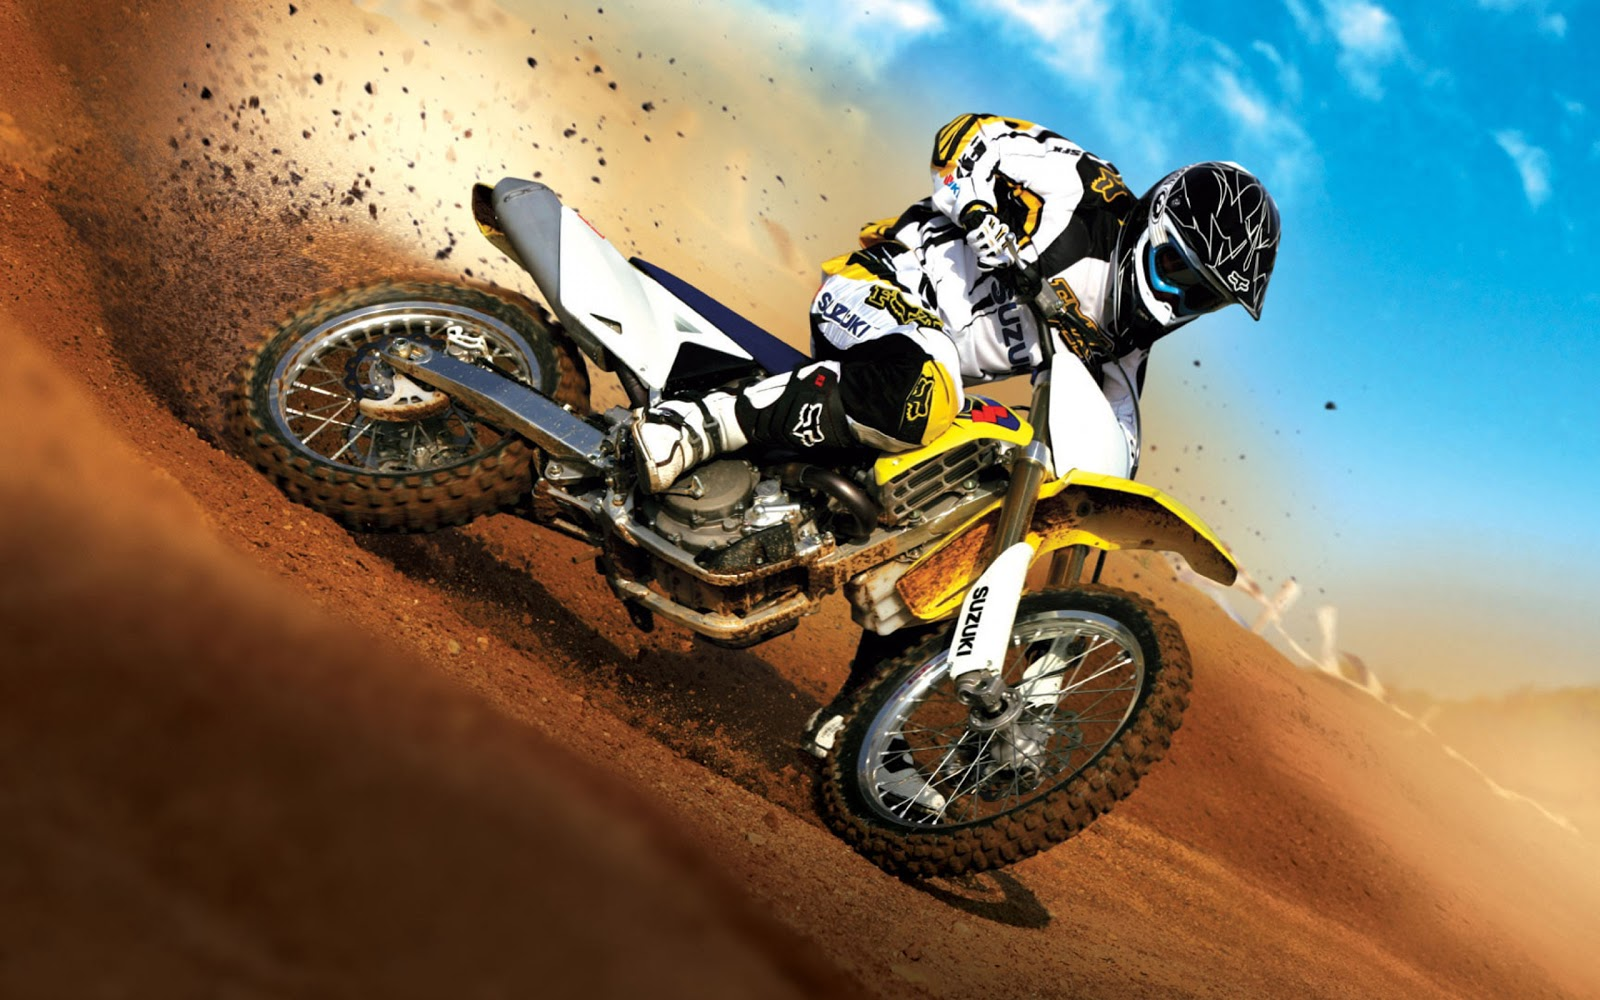 http://3.bp.blogspot.com/-BynE5S6nPSY/T7TIrbyBqLI/AAAAAAAARr8/fTVpChSF3ng/s1600/Suzuki-Motocross-bike2560x1600.jpg